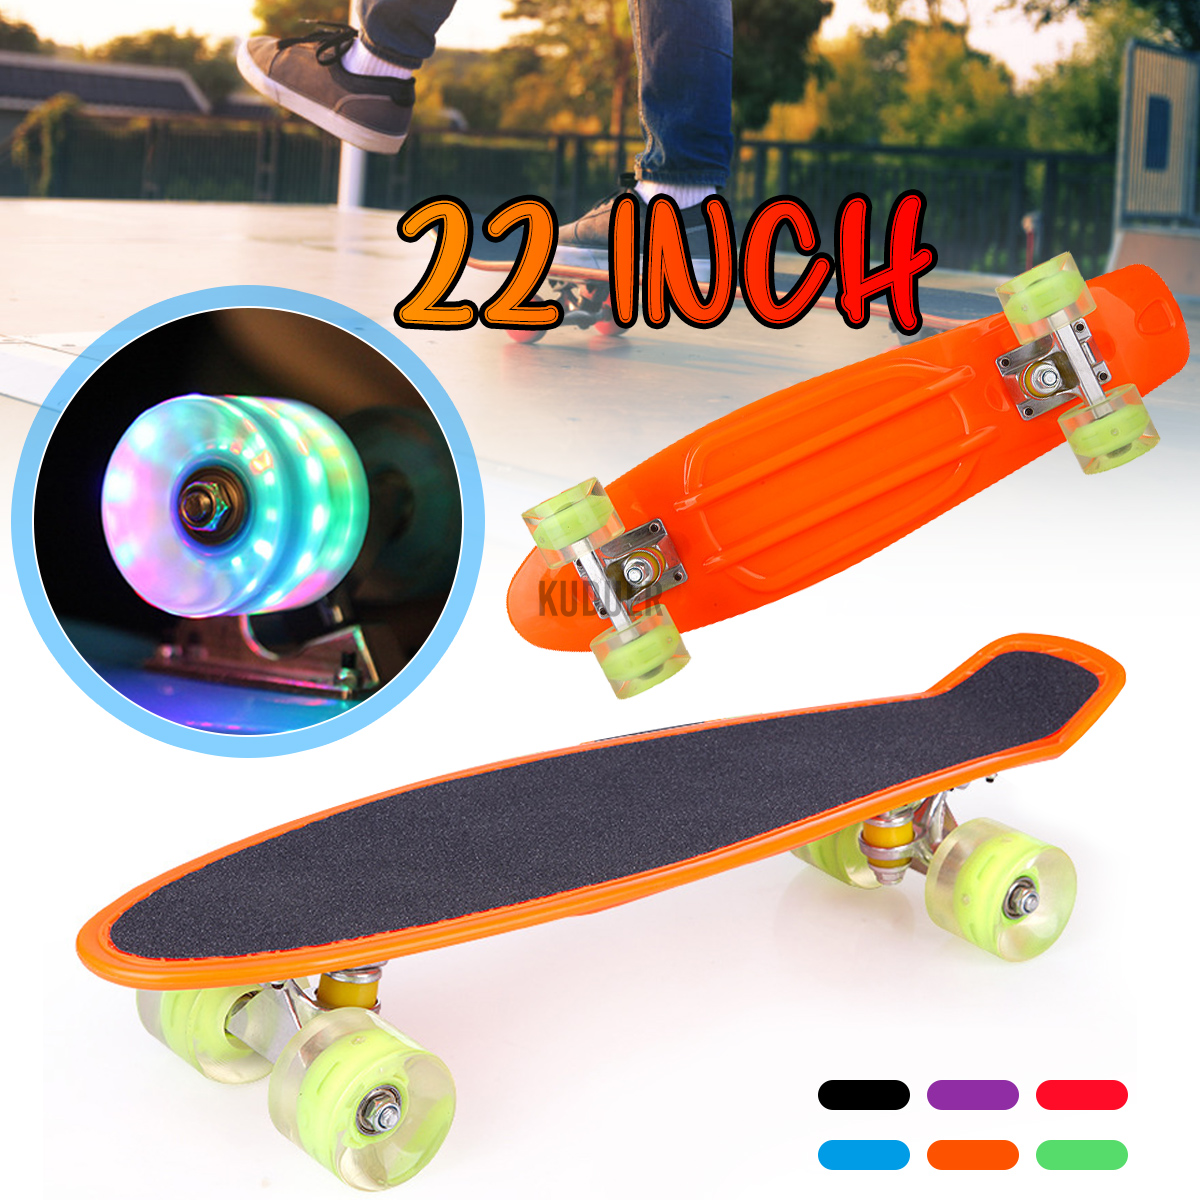 New 4-wheel flash wheel Cruiser Board plastic fishboard skateboard